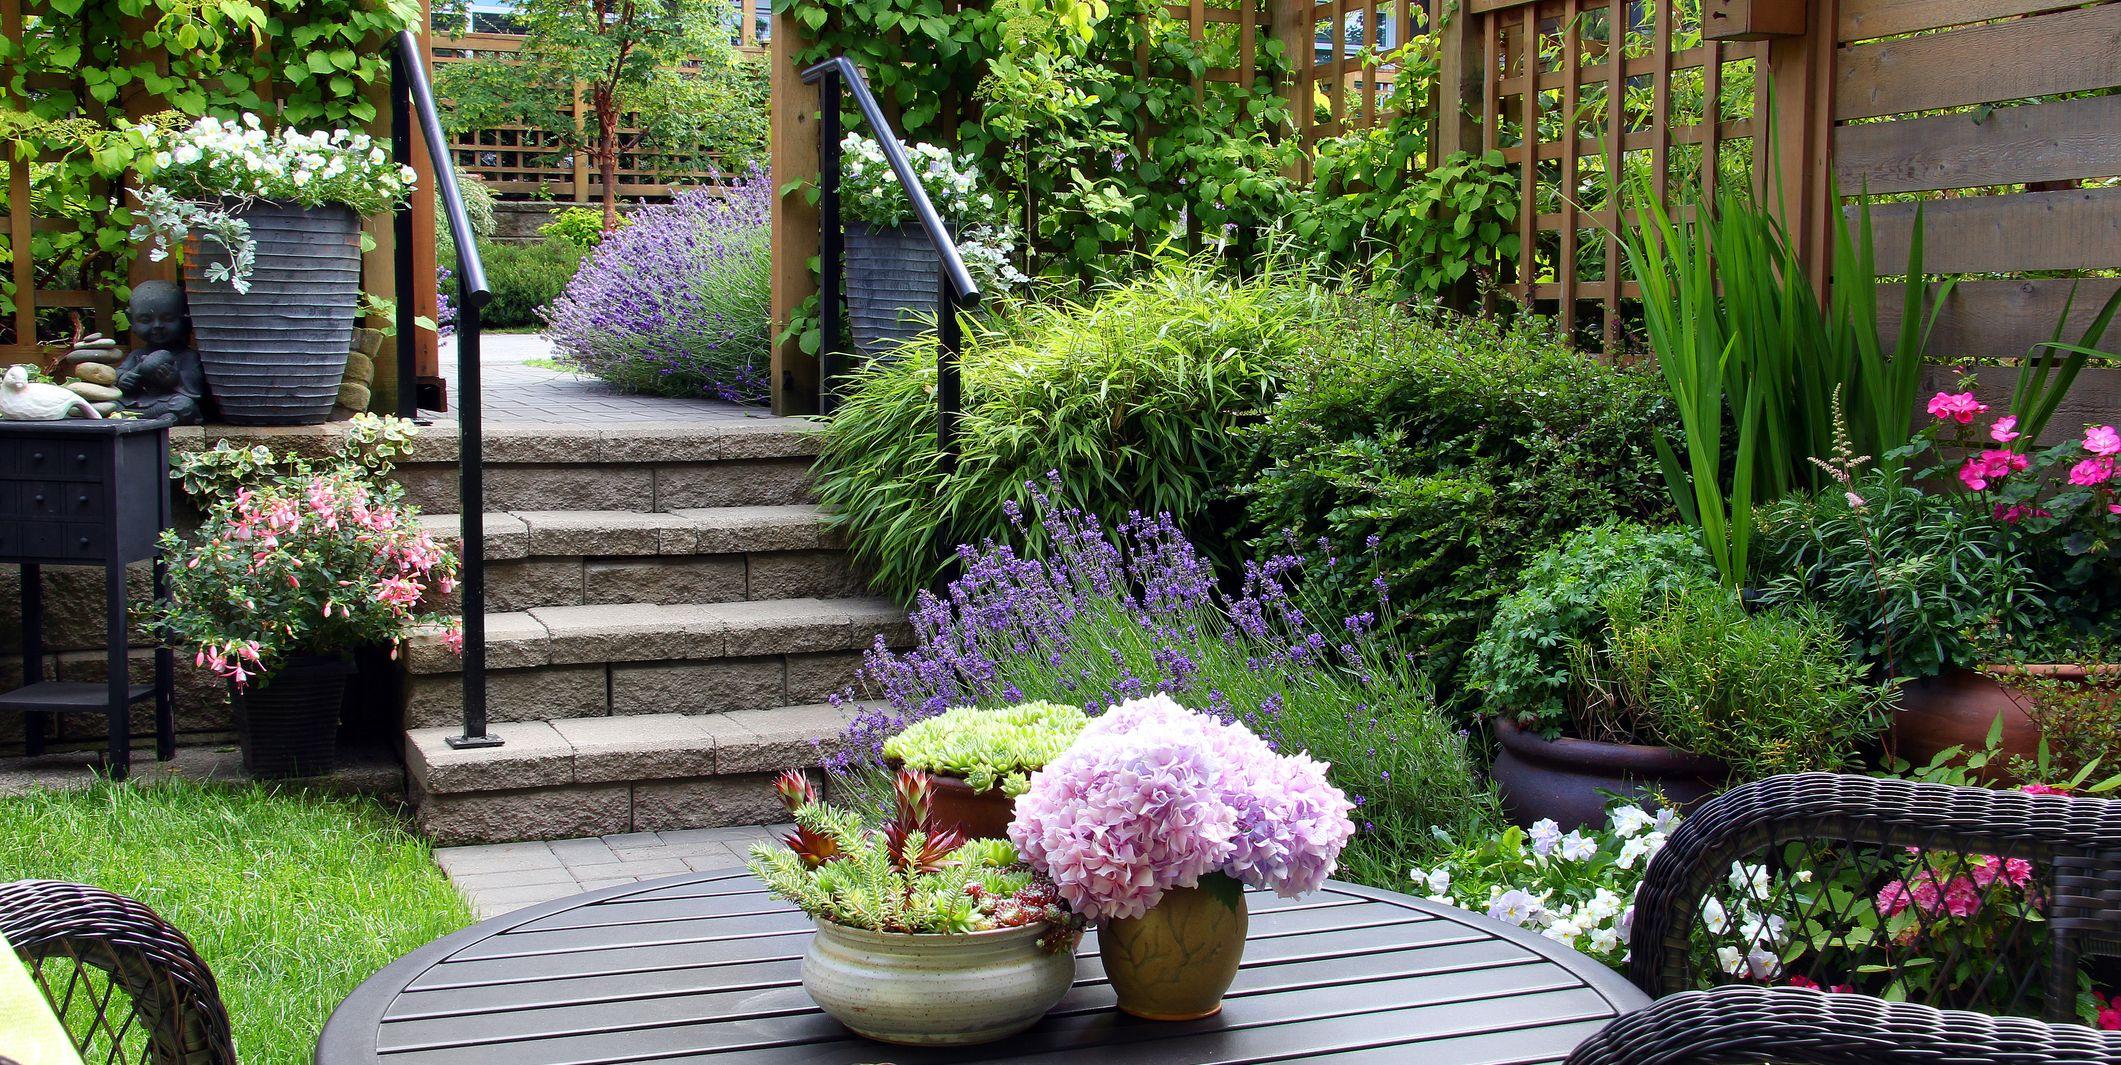 10 small garden design ideas from Gardeners' World's Joe Swift